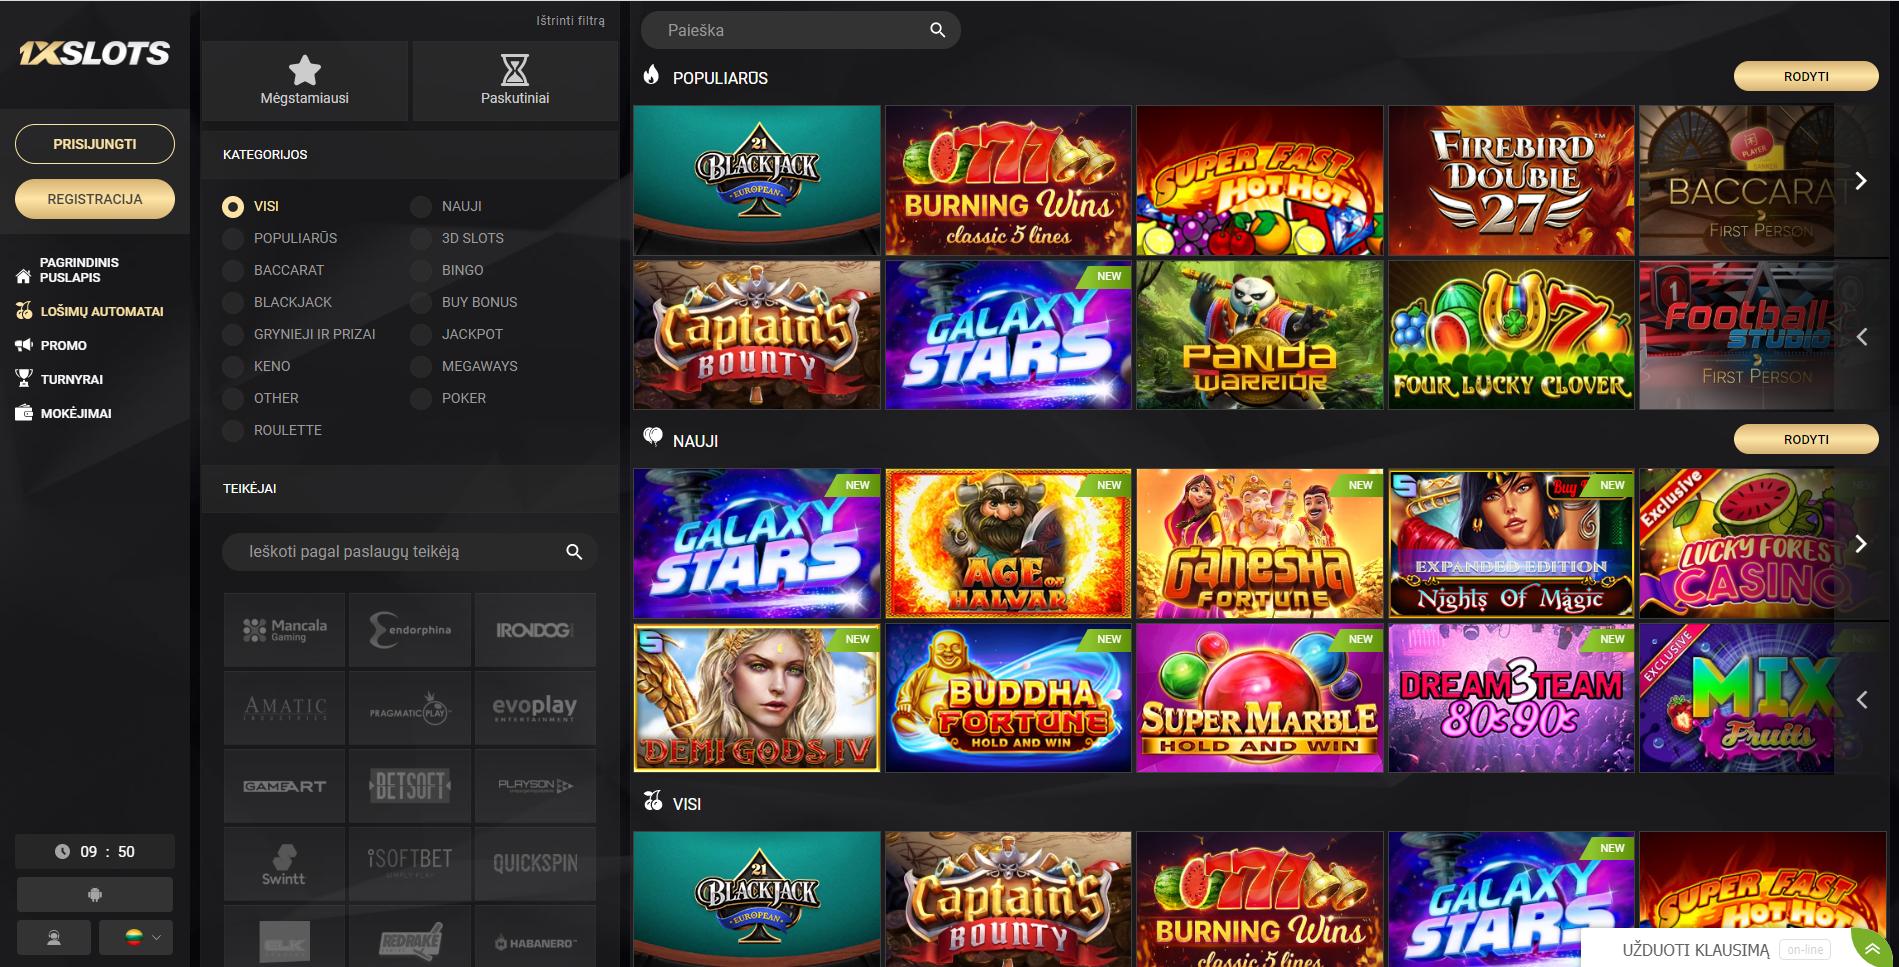 1xslots kazino žaidimai blackjack galaxy stars panda warrior 777 burning wins baccarat demi gods